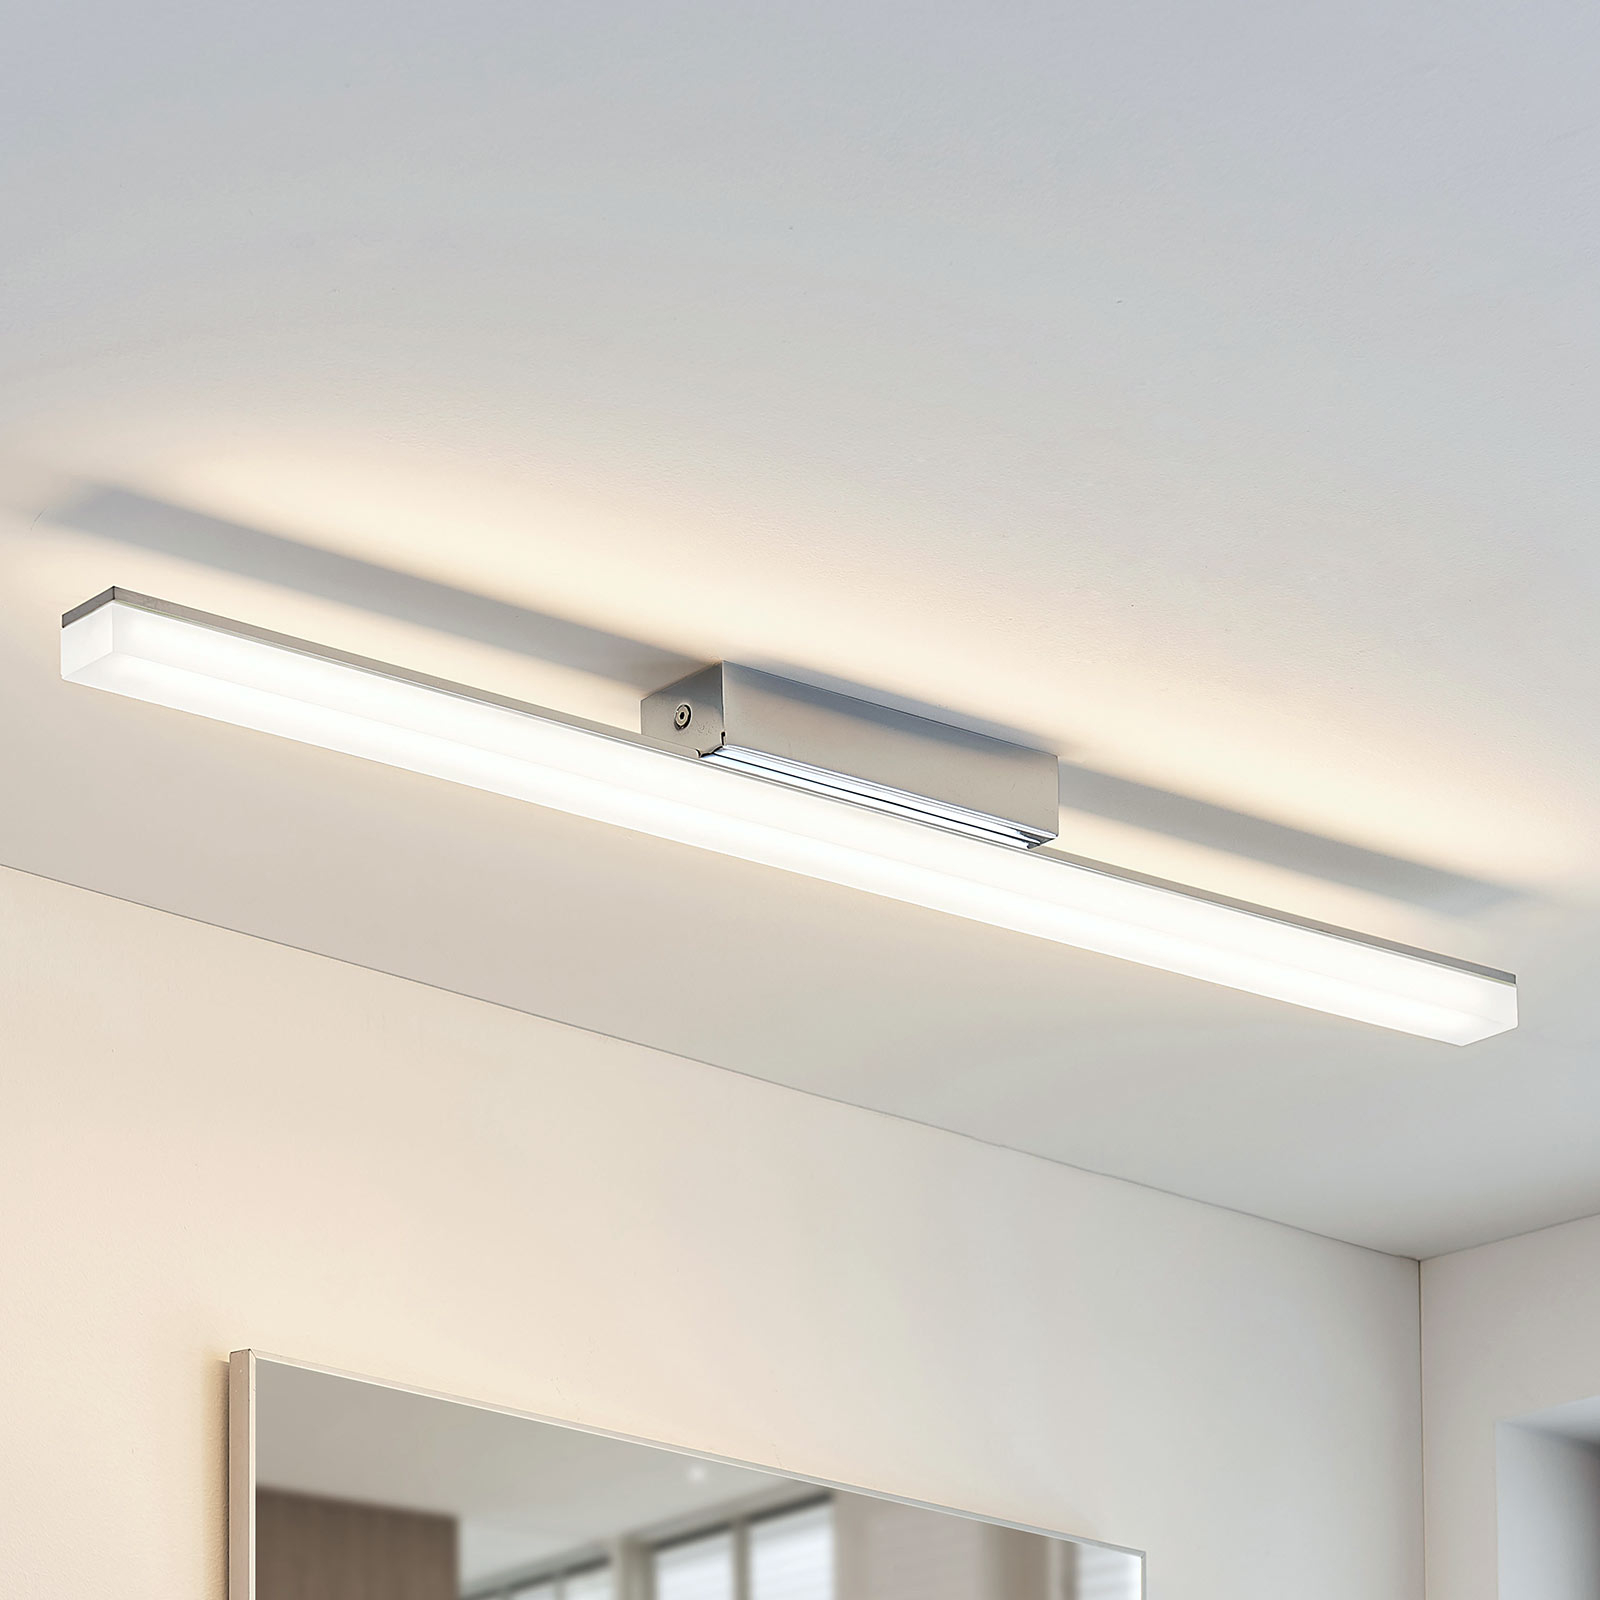 Łazienkowa lampa sufitowa Levke z LED, IP44